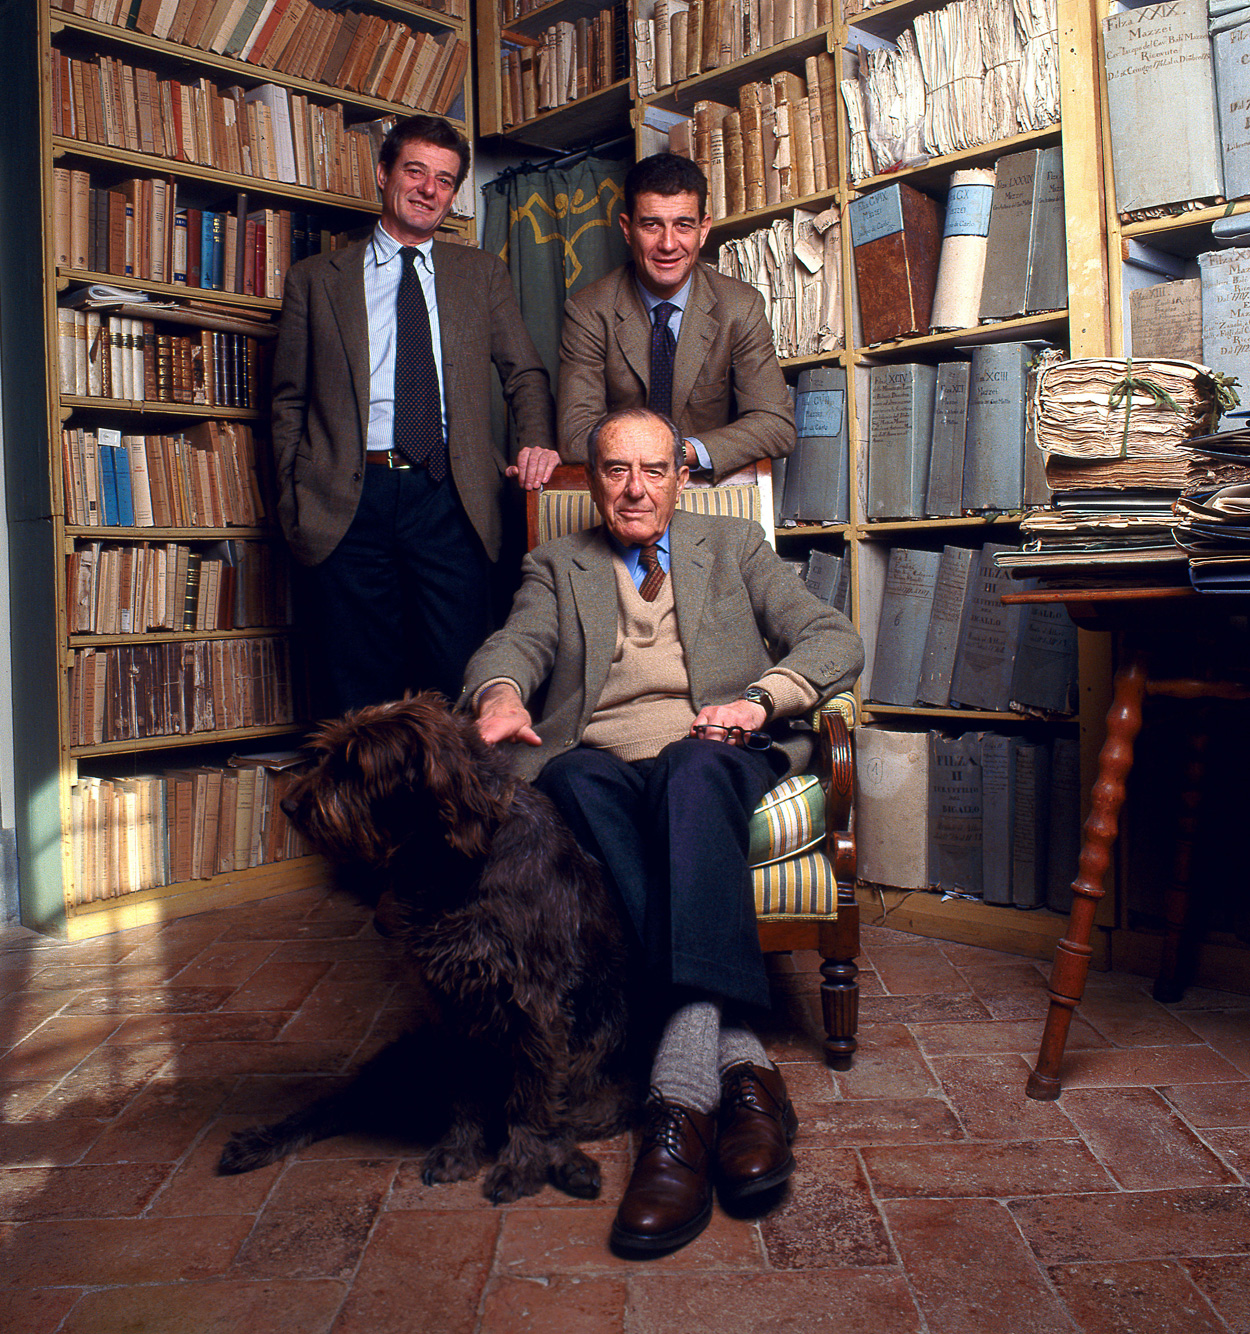 Filippo, Francesco, and Lapo Mazzei